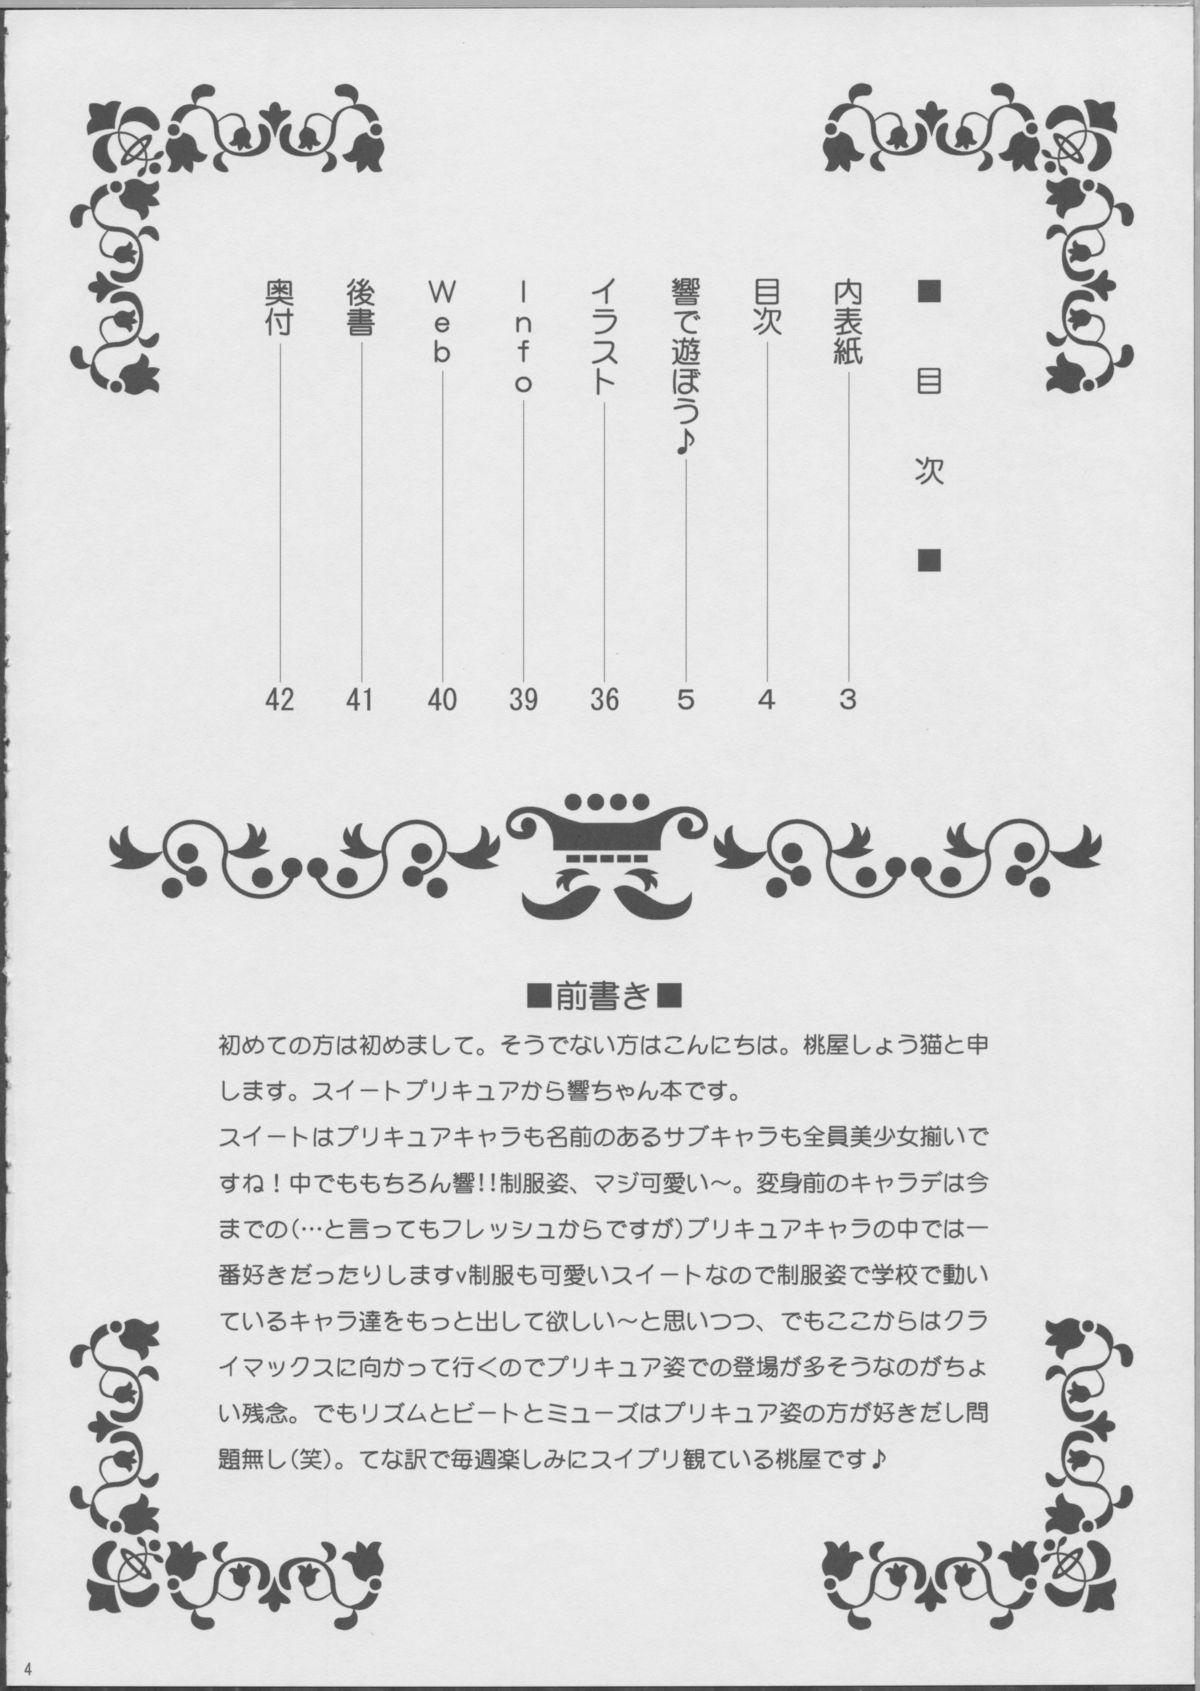 Hibiki de asobou ♪ 2